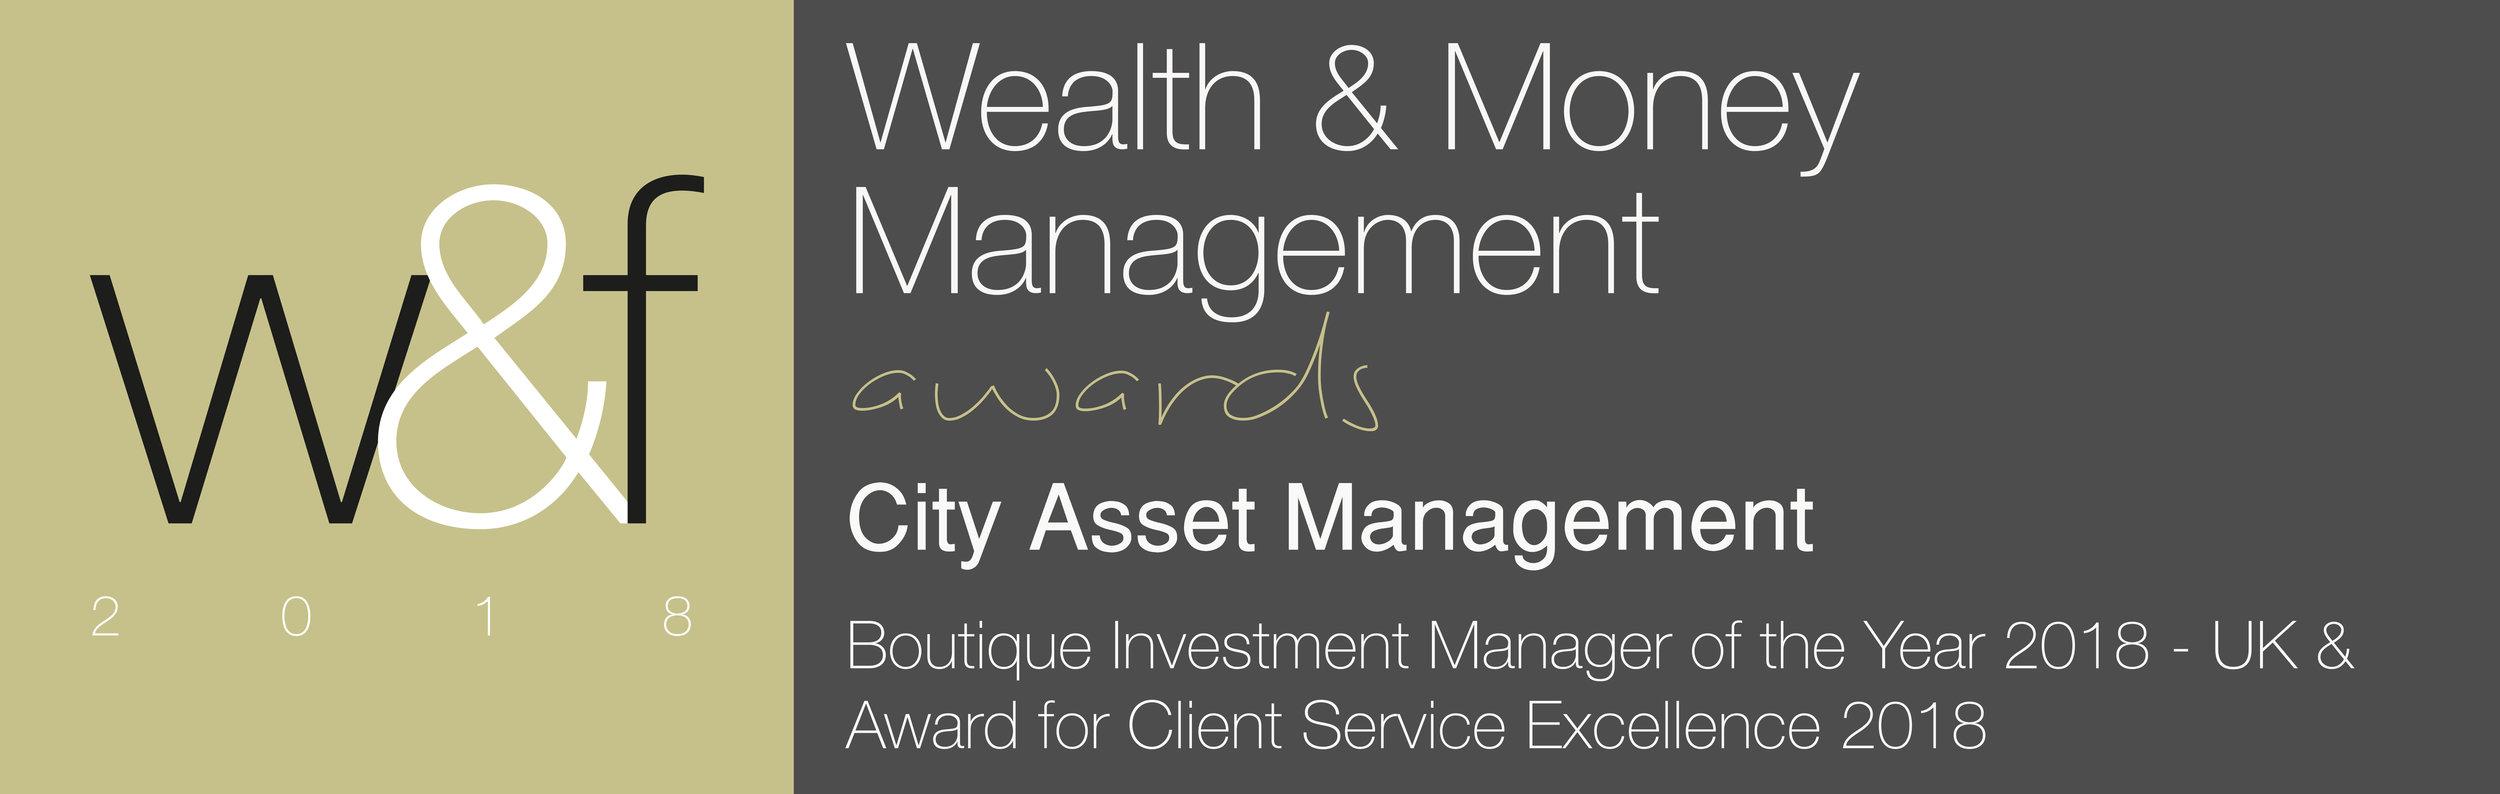 WM180006-2018 Wealth  Money Management Awards Winners Logo.jpg